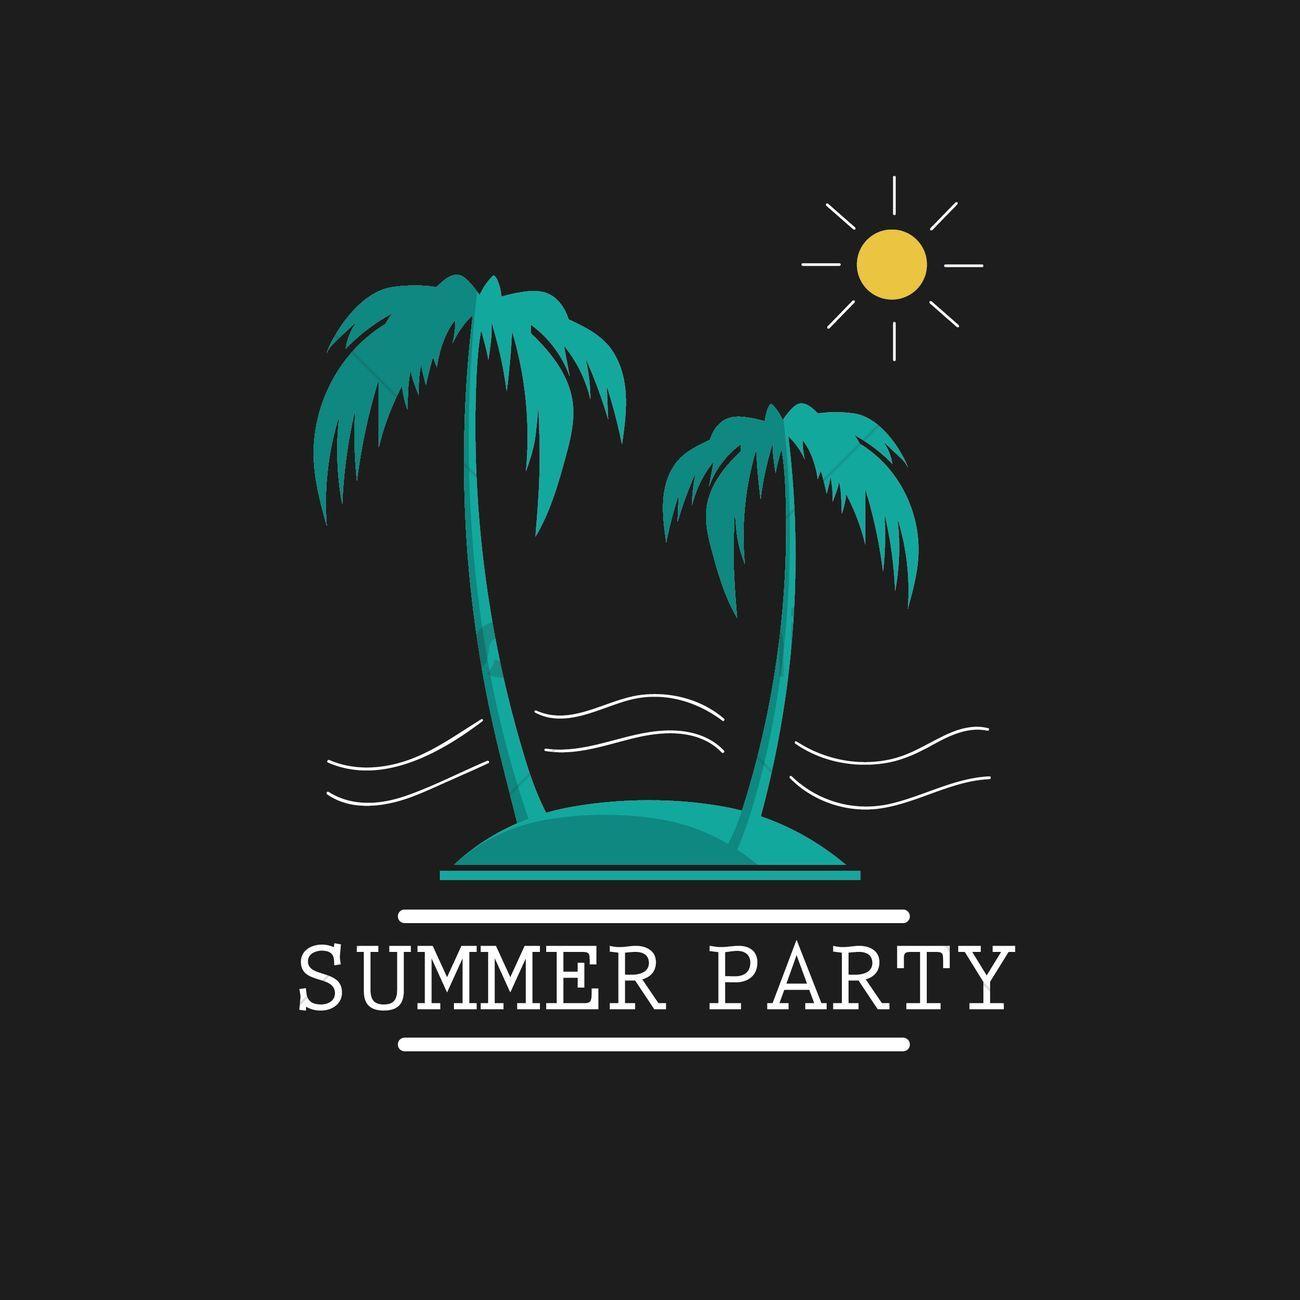 Summer Party Wallpaper Vectors Stock Clipart Affiliate